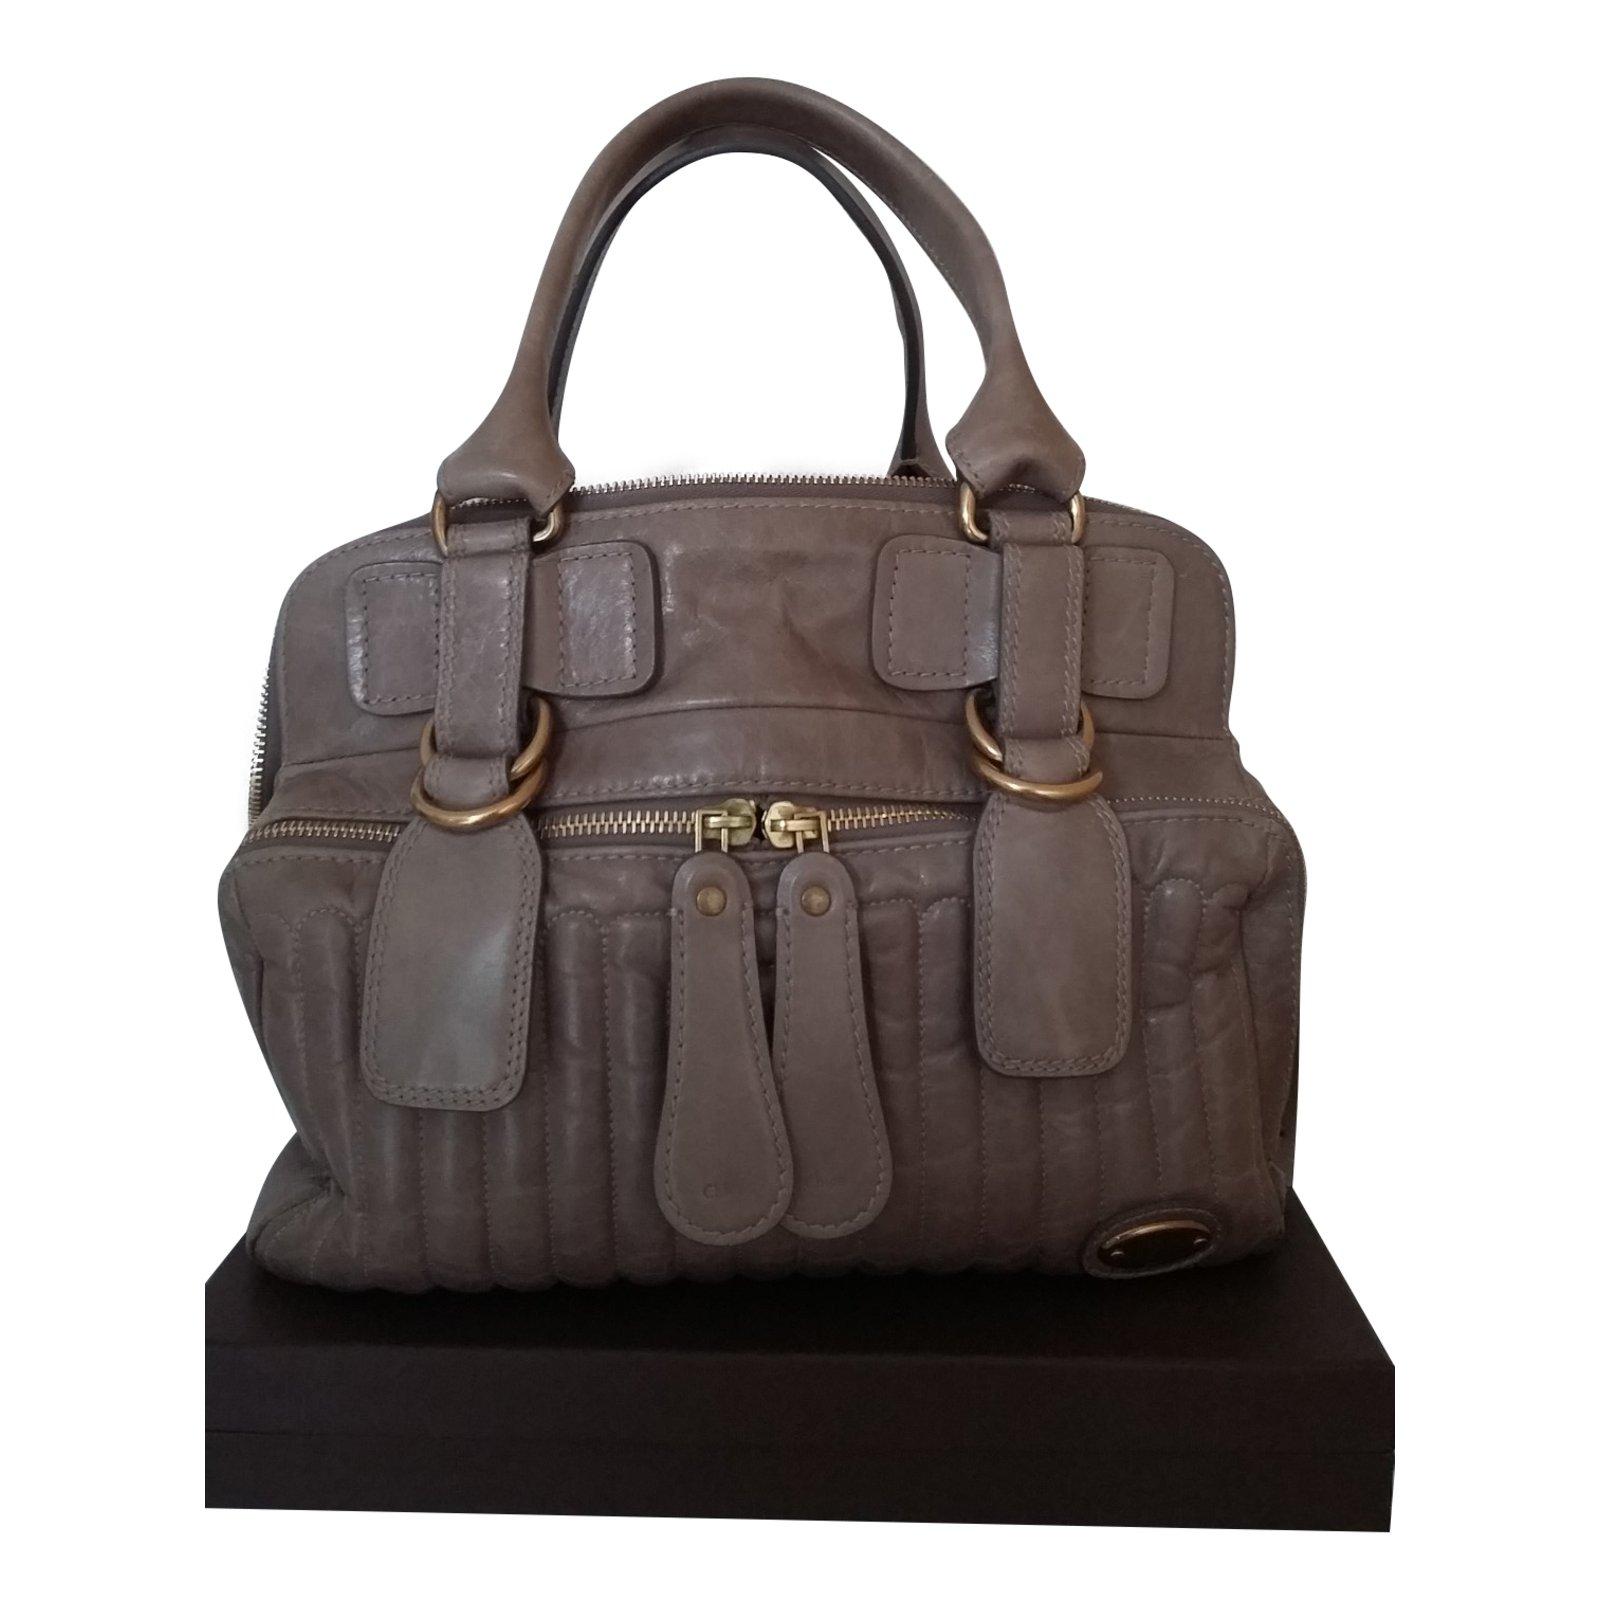 Chloé Bay Handbags Leather Beige Ref 57528